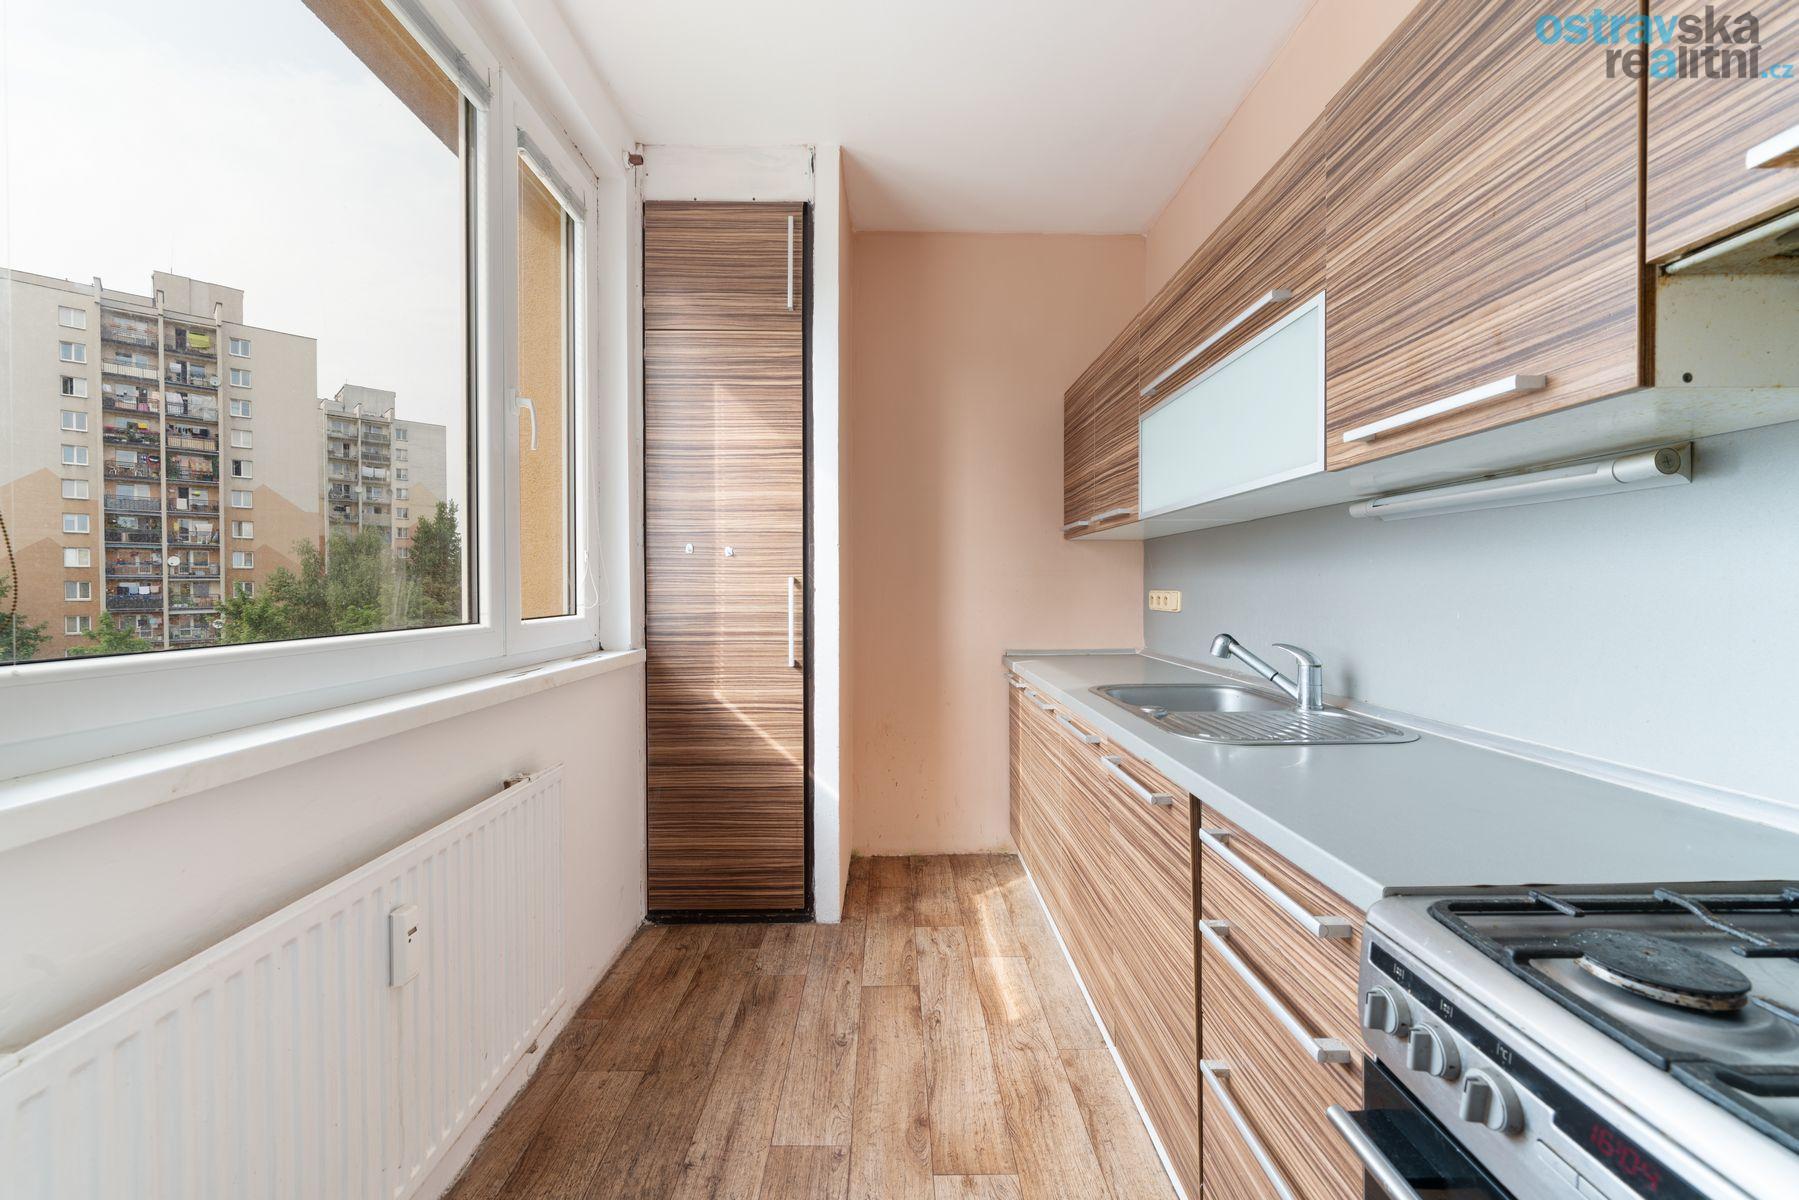 Prodej, byt 3+1 Ostrava - Dubina, ul. Emanuela Podgorného, 73 m2, lodžie